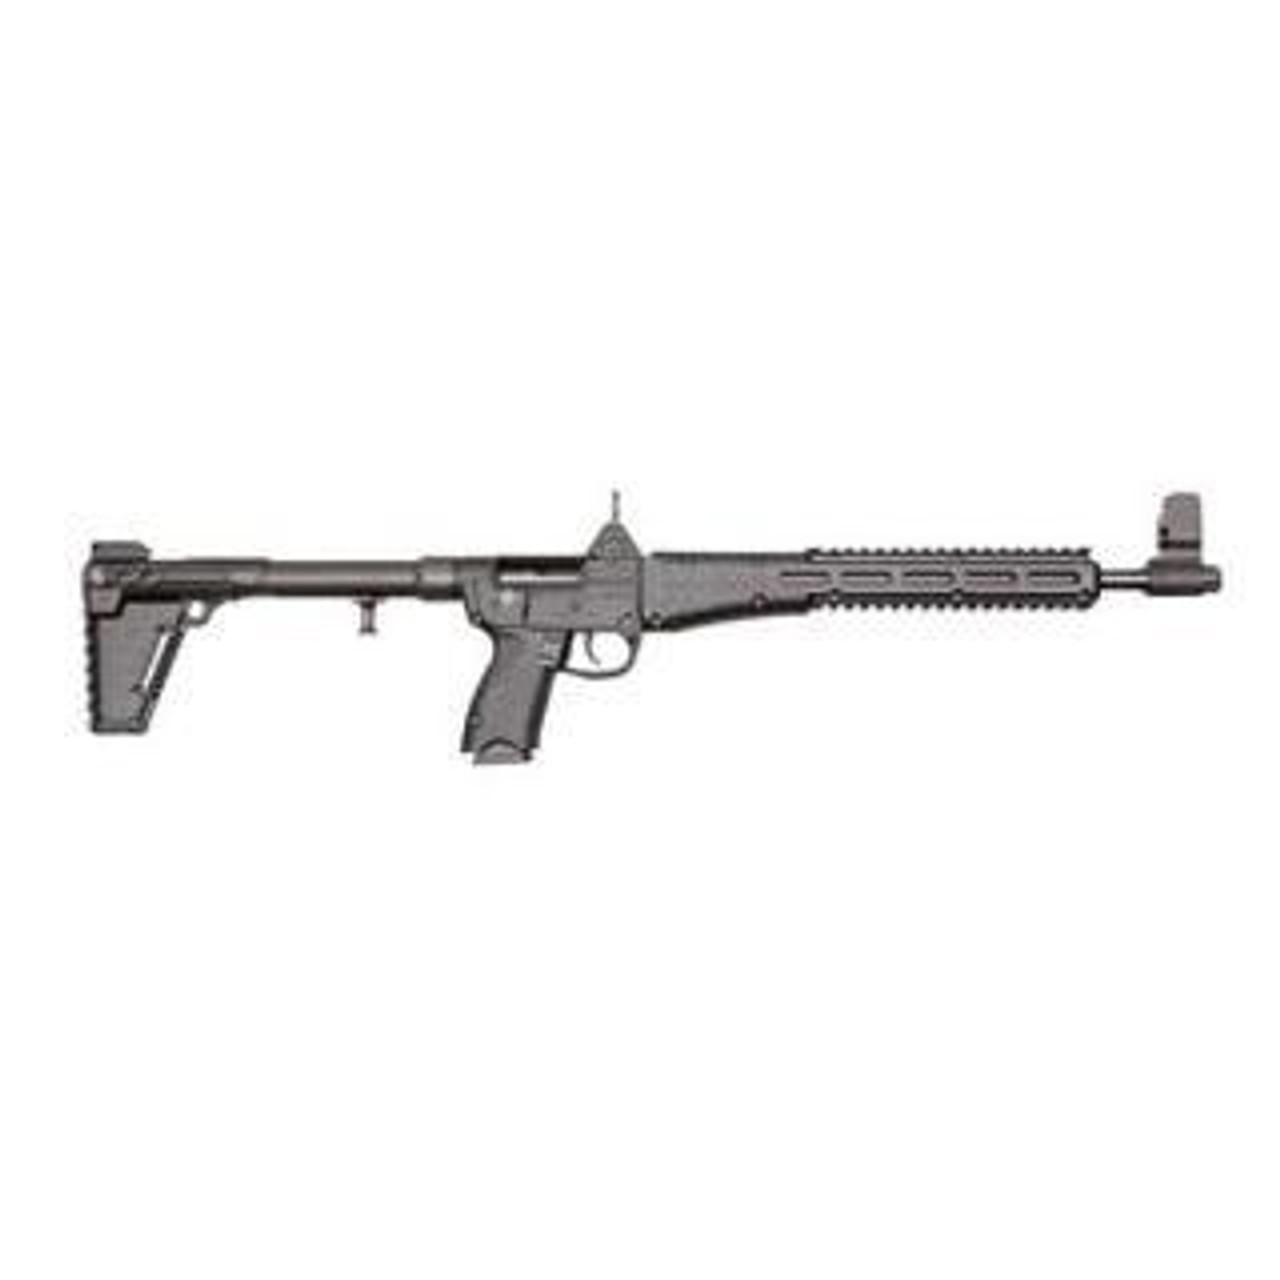 Kel Tec Sub2000 Gen2(GLOCK 17) CALIFORNIA LEGAL - 9mm-